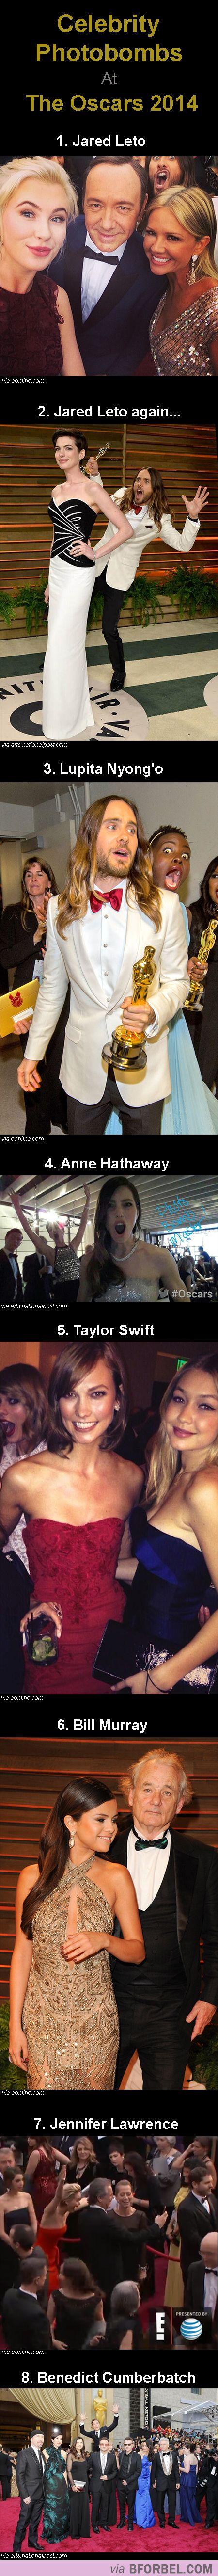 8 Epic Celebrity Photobombs At The Oscars 2014…